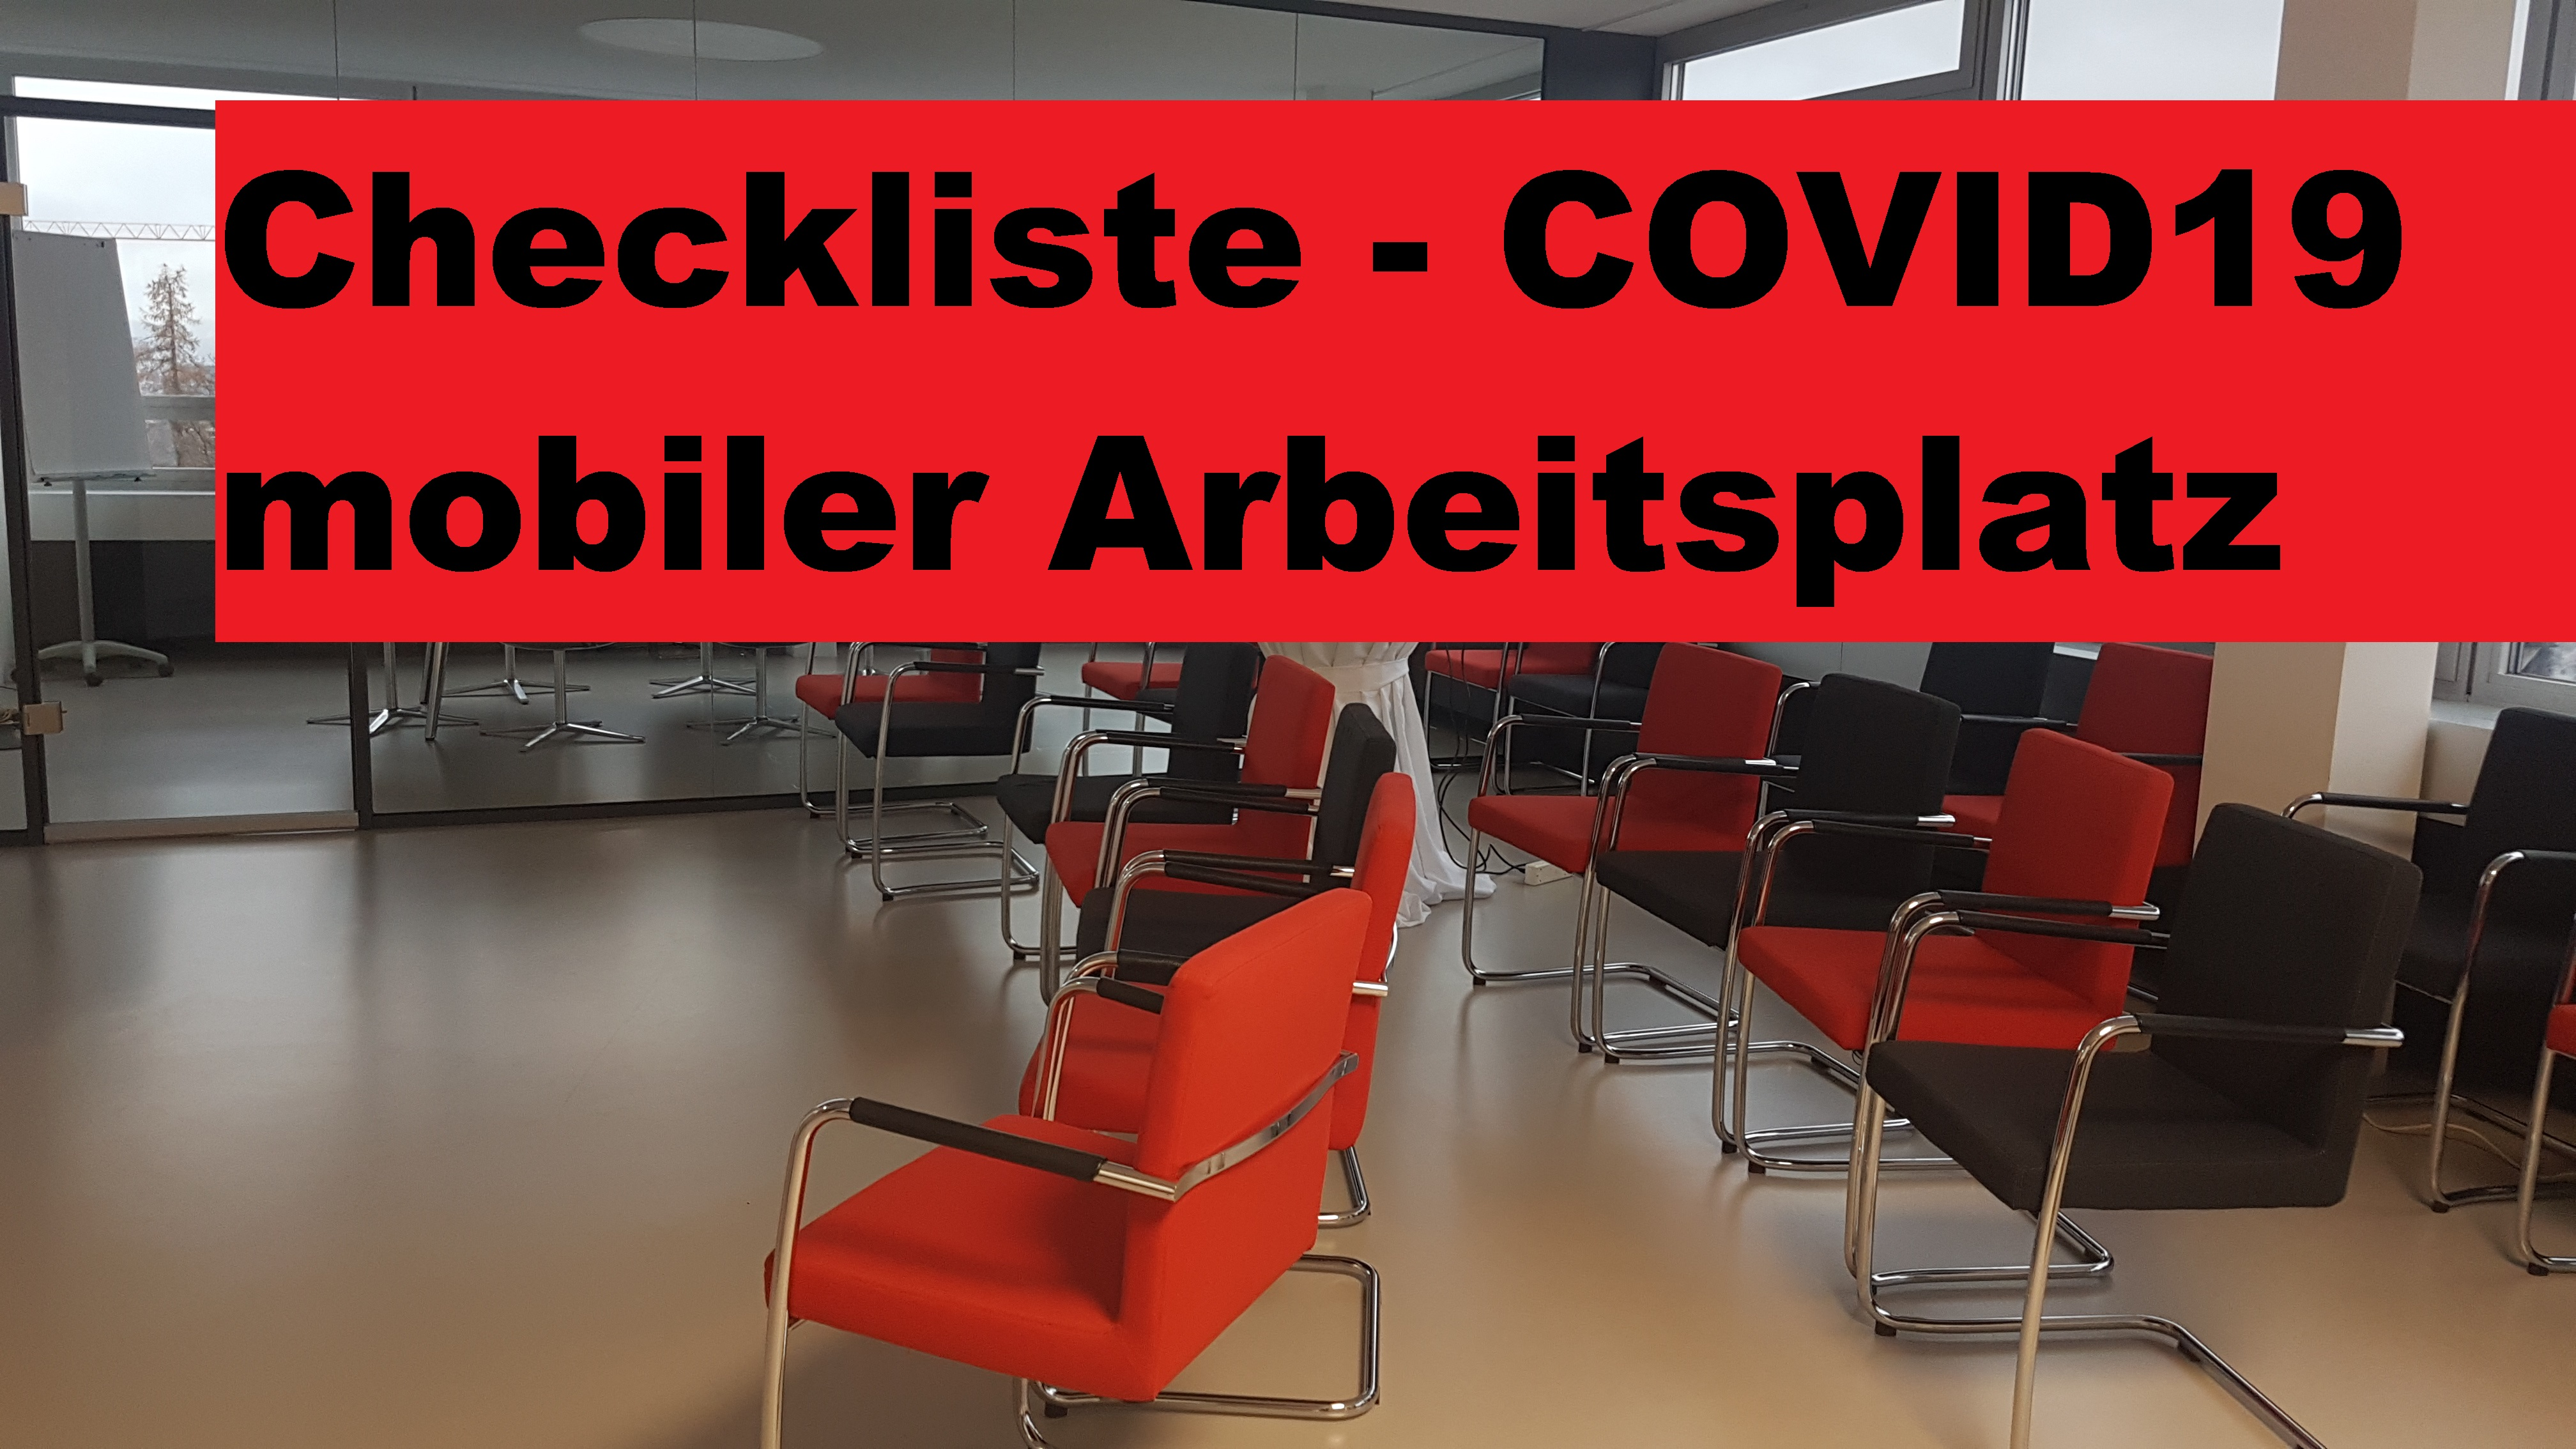 Checkliste mobiler Arbeitsplatz, Homeoffice – Corona Krise – COVID19